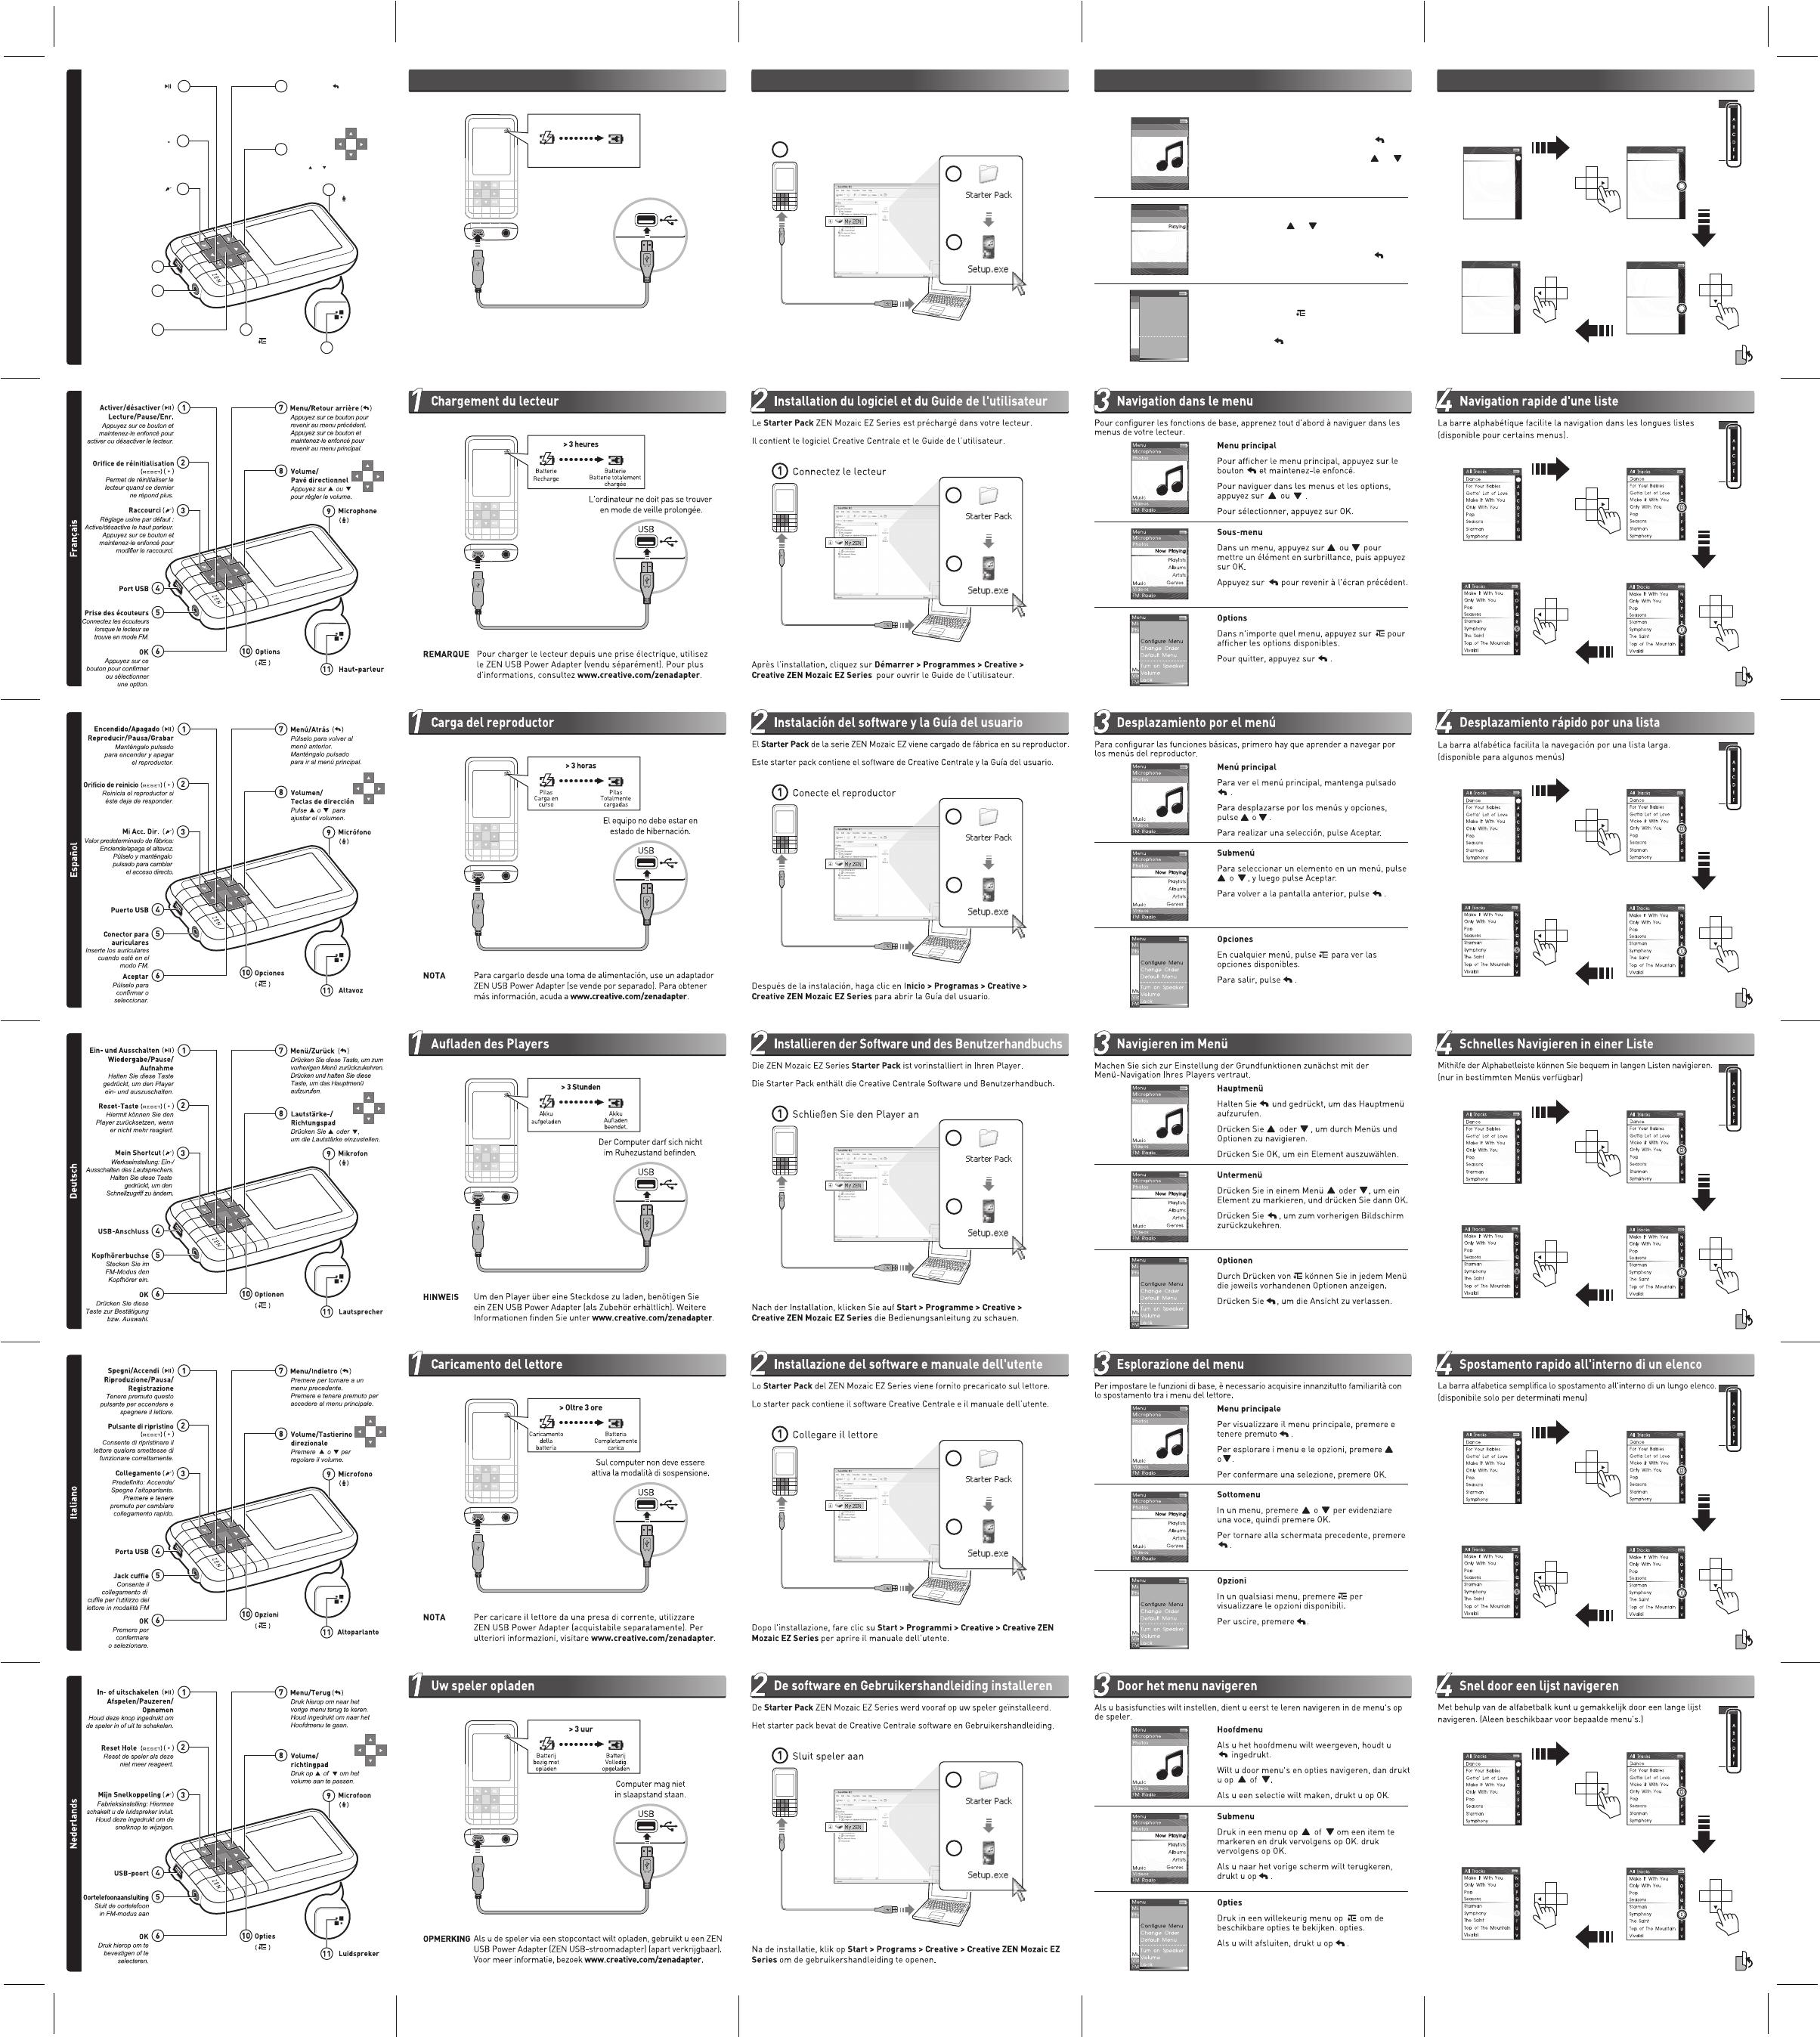 bedienungsanleitung creative zen mozaic ez100 seite 1 von 1 rh libble de user manual creative zen mozaic ez300 creative zen mozaic mp3 player manual